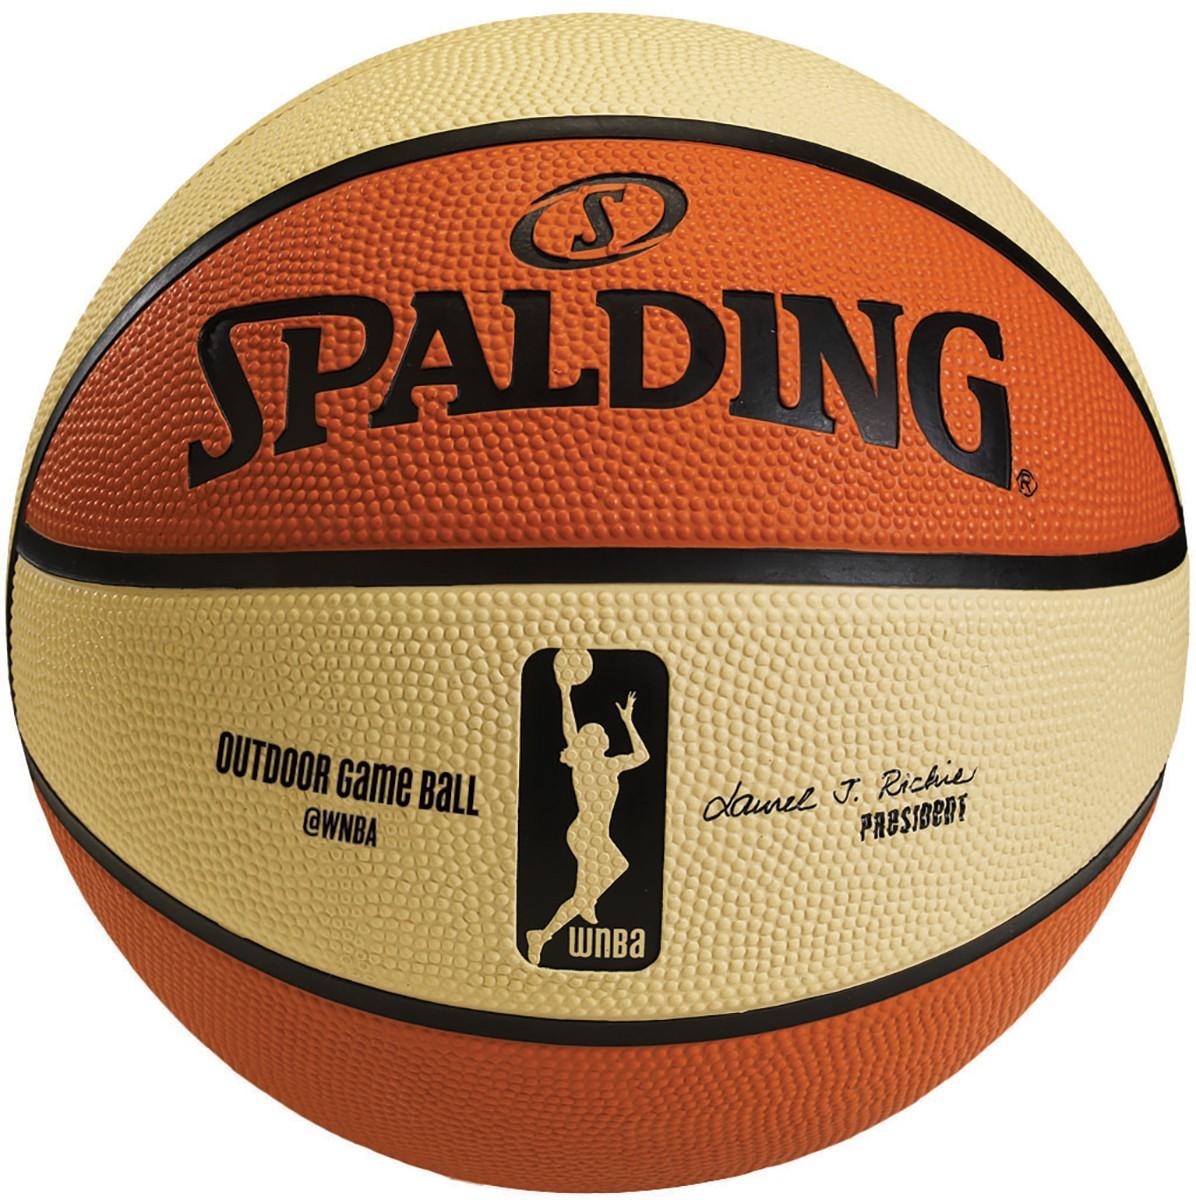 Spalding Wnba Replica 28 5 Quot Outdoor Basketball A55 906